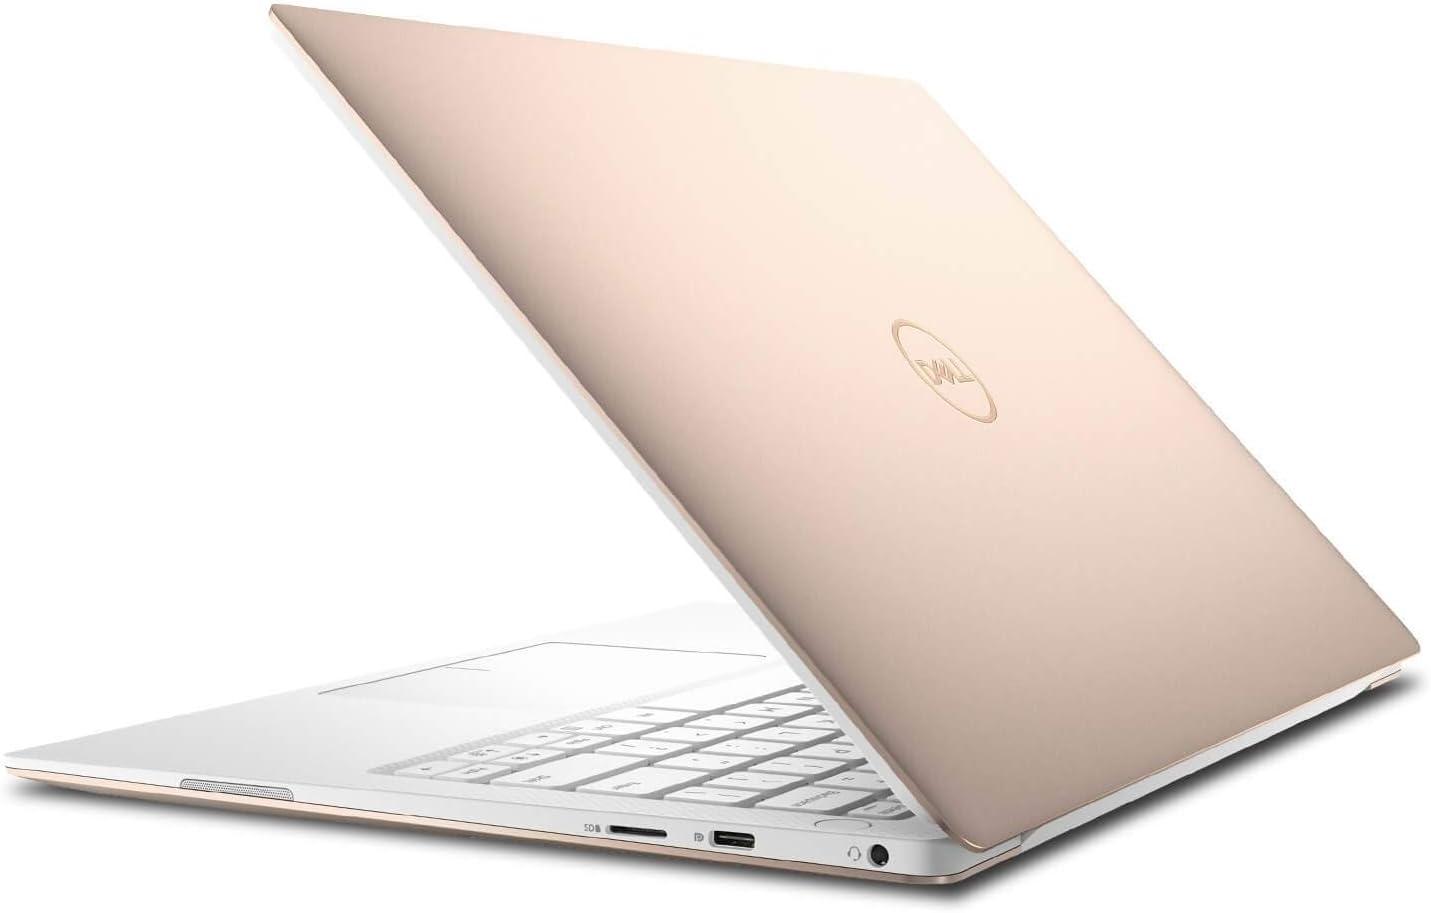 Dell XPS 13 9370 Laptop w/ Core i3-8130u (2.20GHz) / 4GB / FHD (1920 x 1080) Non-Touch / 512GB / Windows 10 - Gold